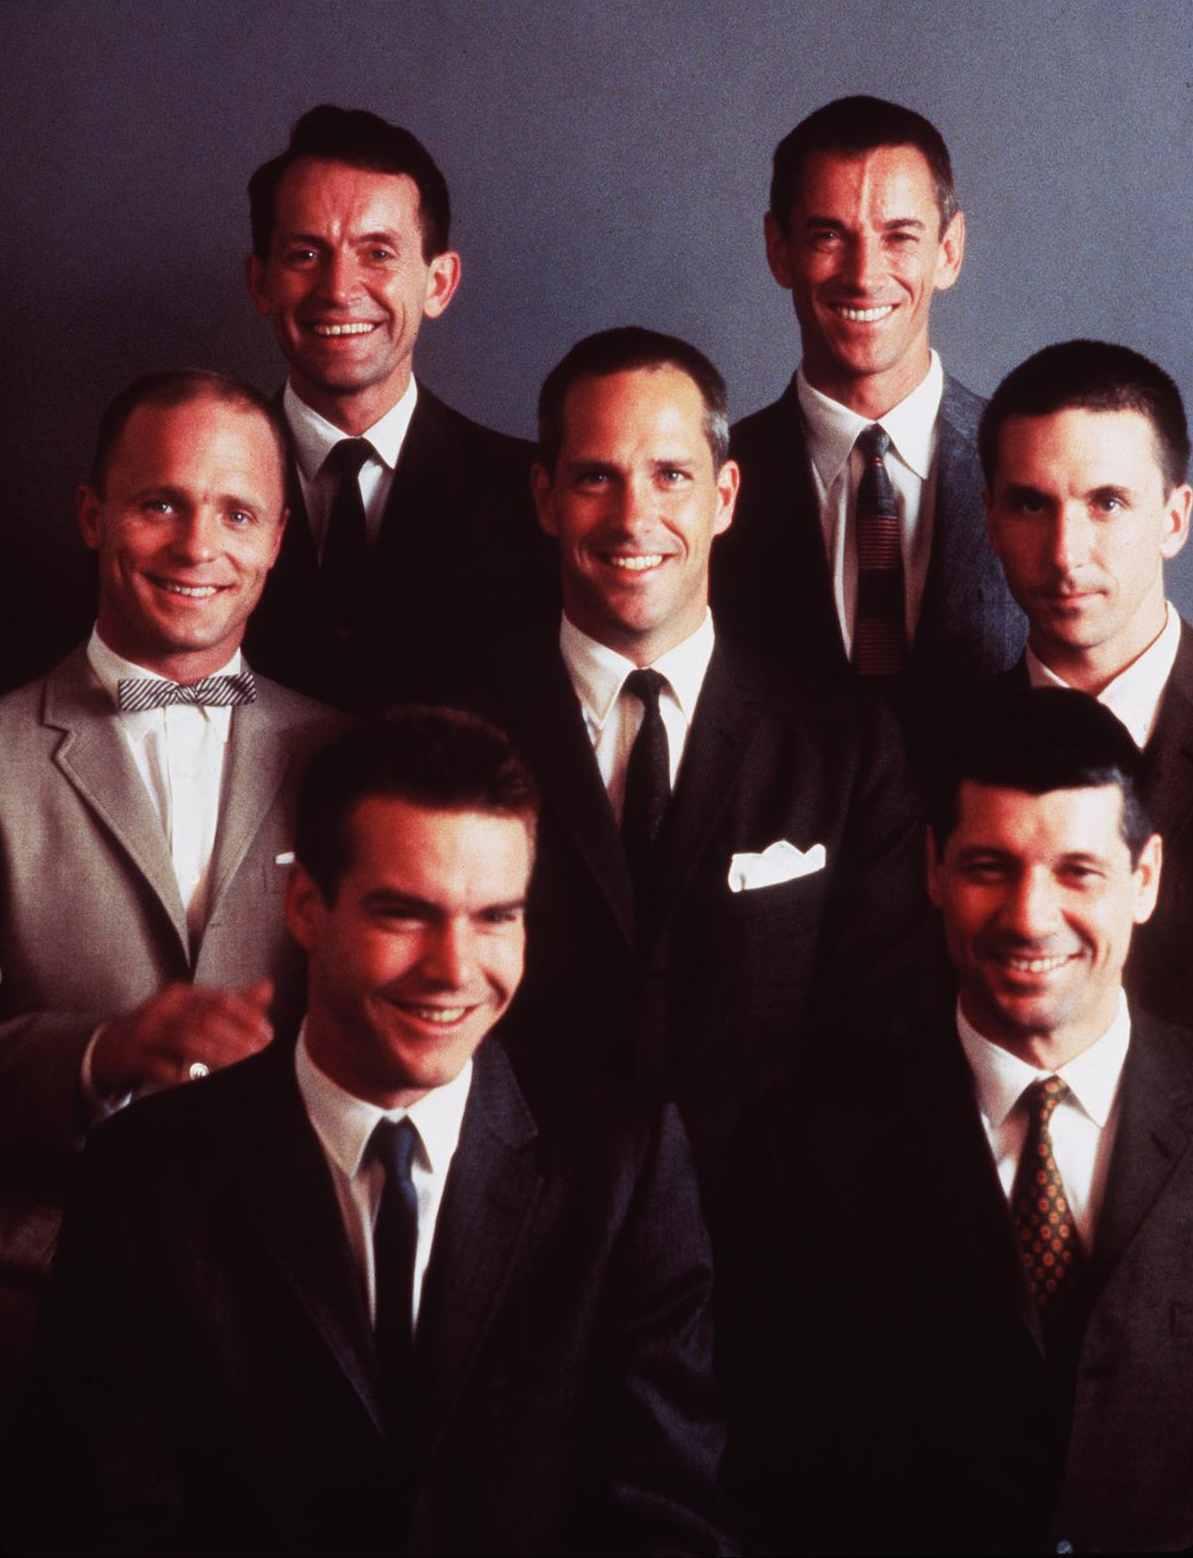 Ed Harris, Lance Henriksen, Dennis Quaid, Scott Glenn, Charles Frank, Scott Paulin, and Fred Ward in The Right Stuff (1983)